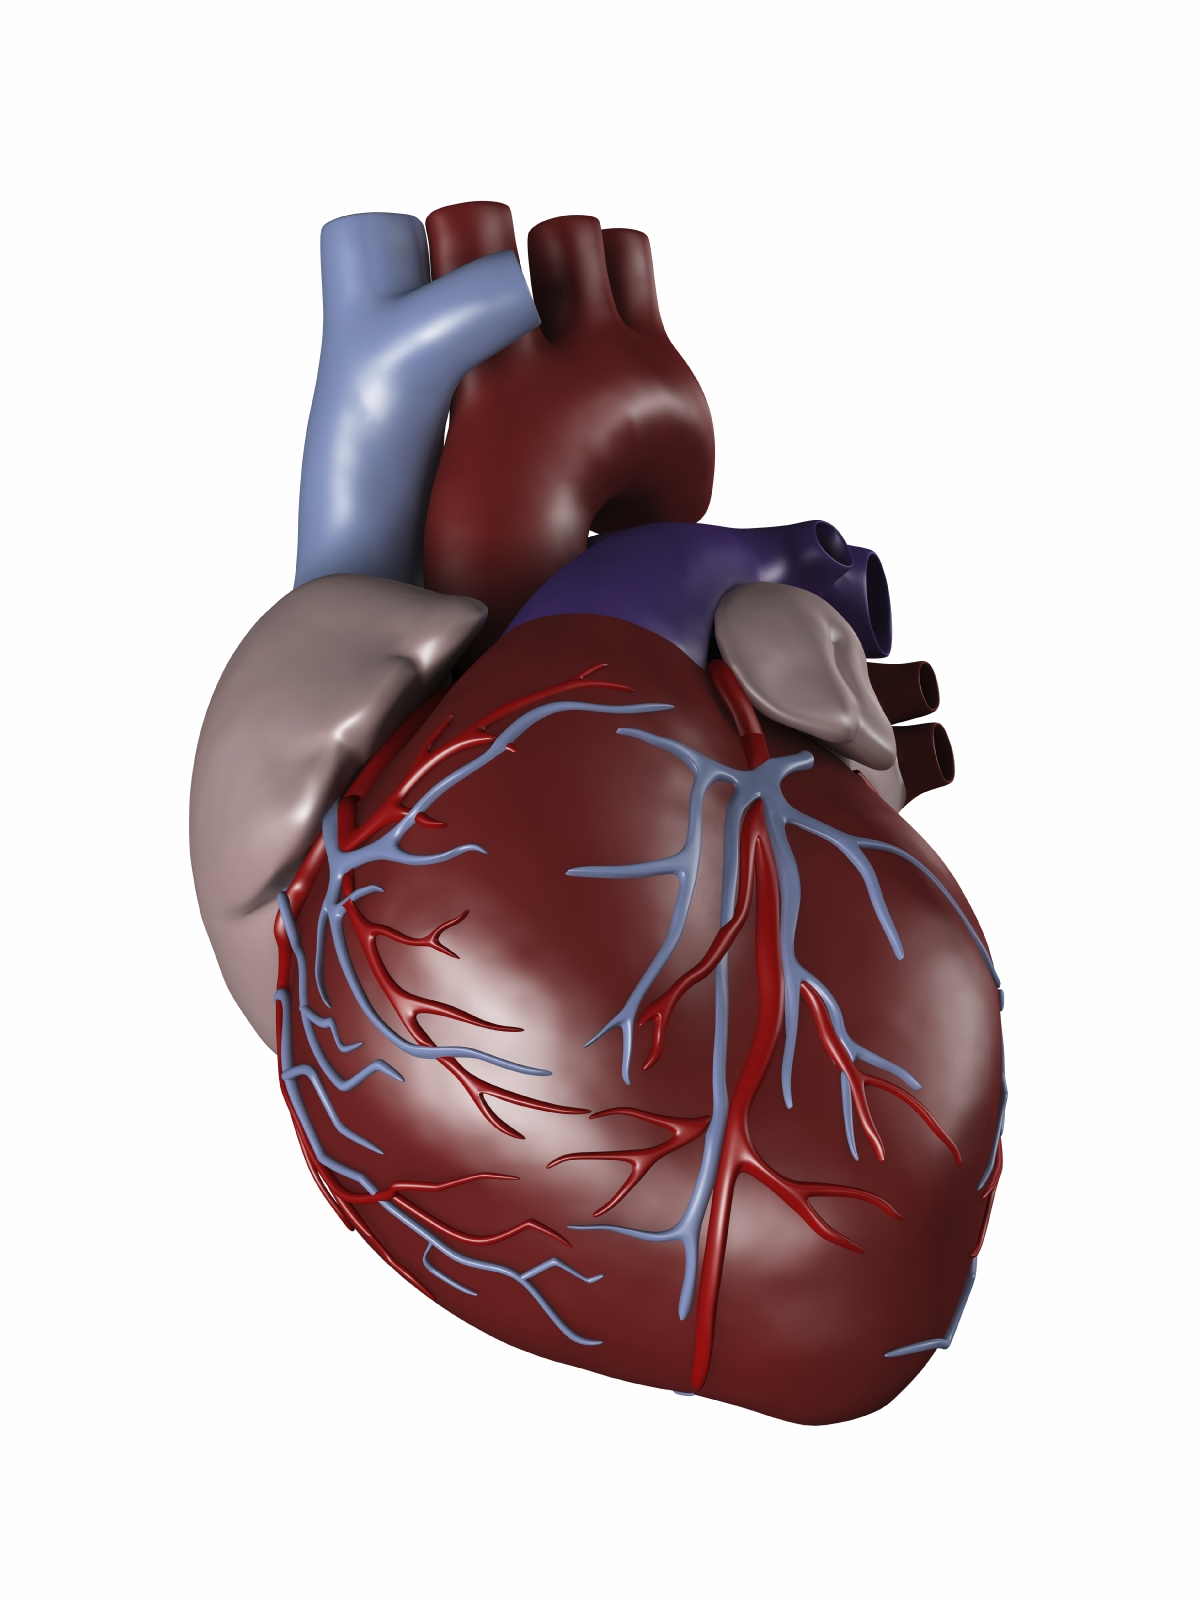 Heart disease | France| PDF | PPT| Case Reports | Symptoms | Treatment